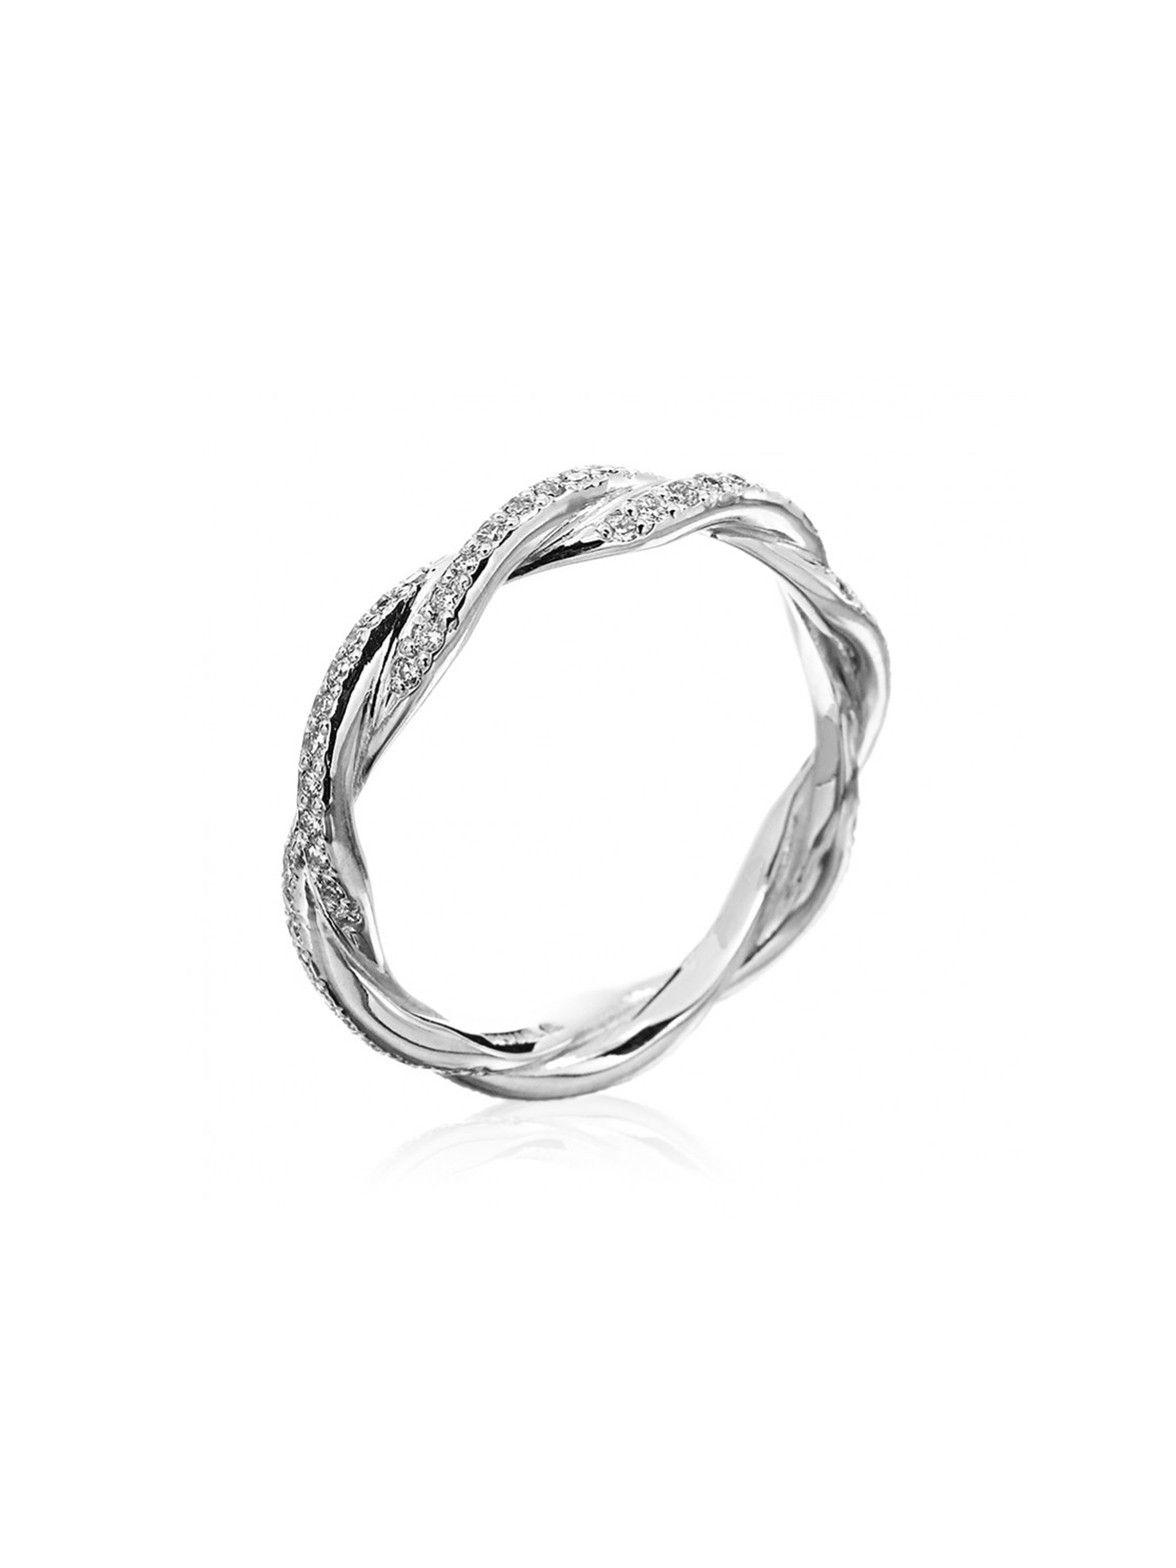 infinity twist wedding band Michael B Platinum Double Twist Eternity Band at London Jewelers Love this Infinity Ring EngagementInfinity Wedding